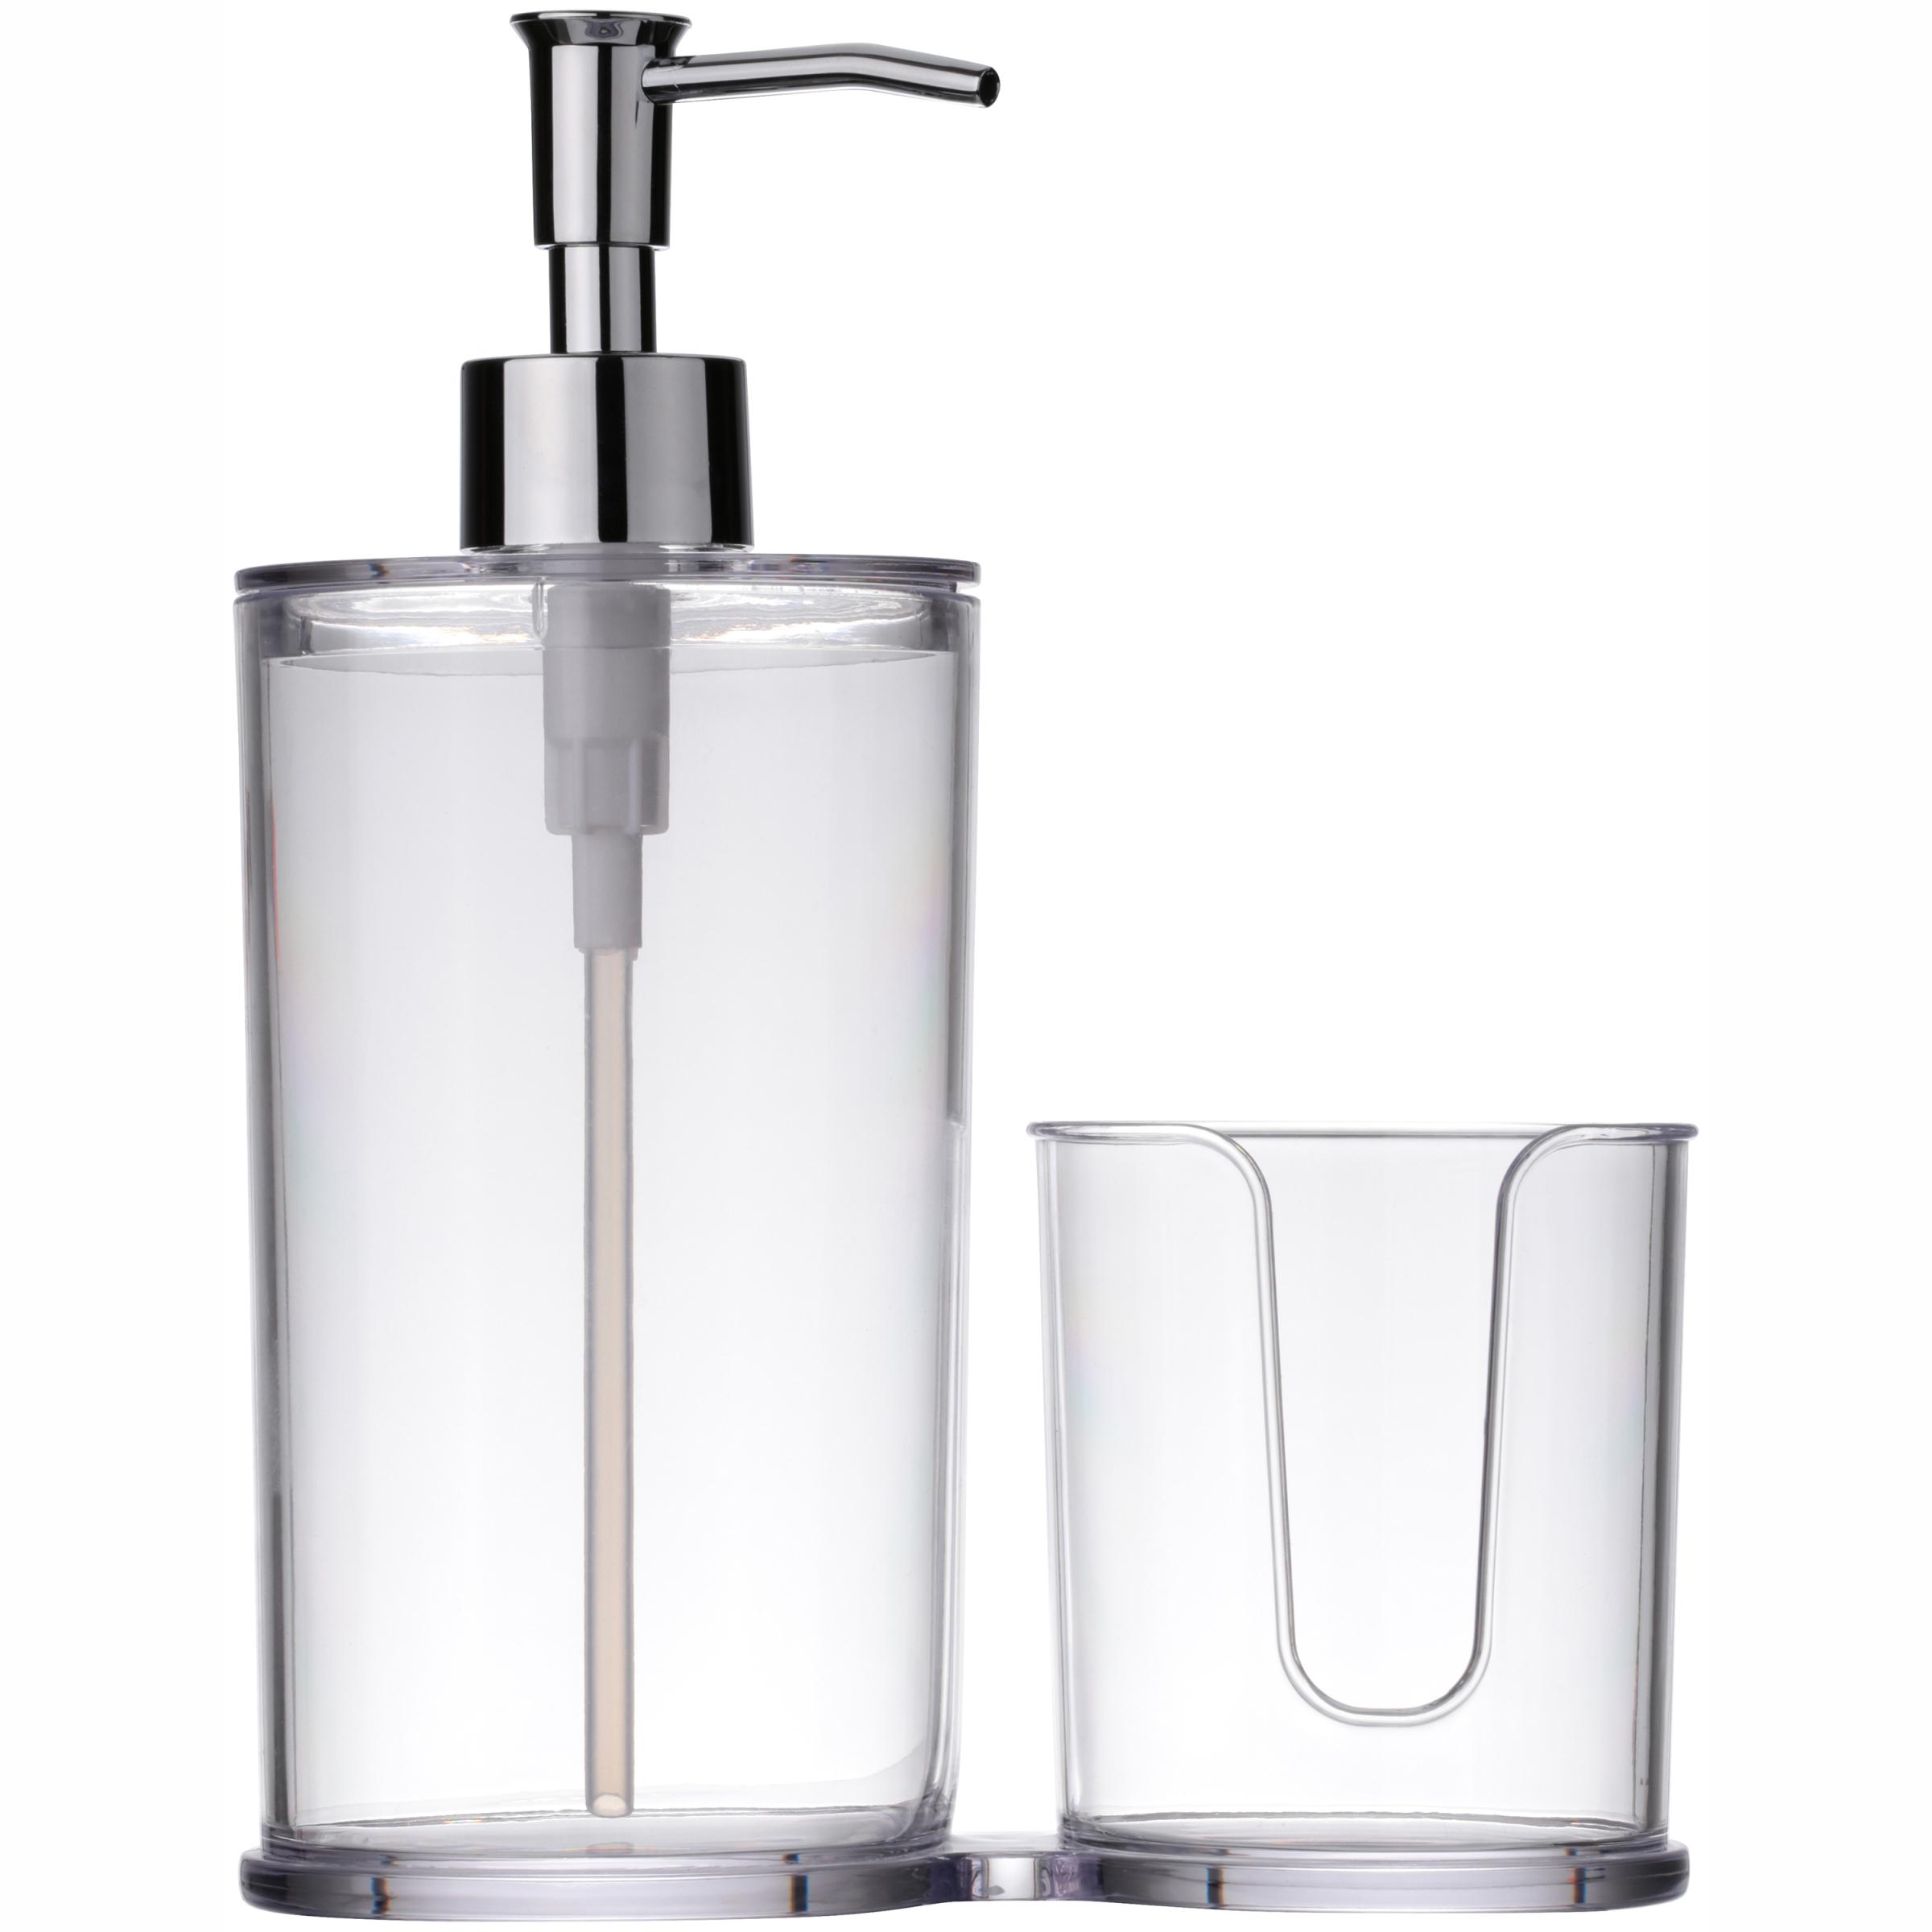 Mainstays True Color Clear Mouthwash Dispenser & Cup Holder, 2 Piece